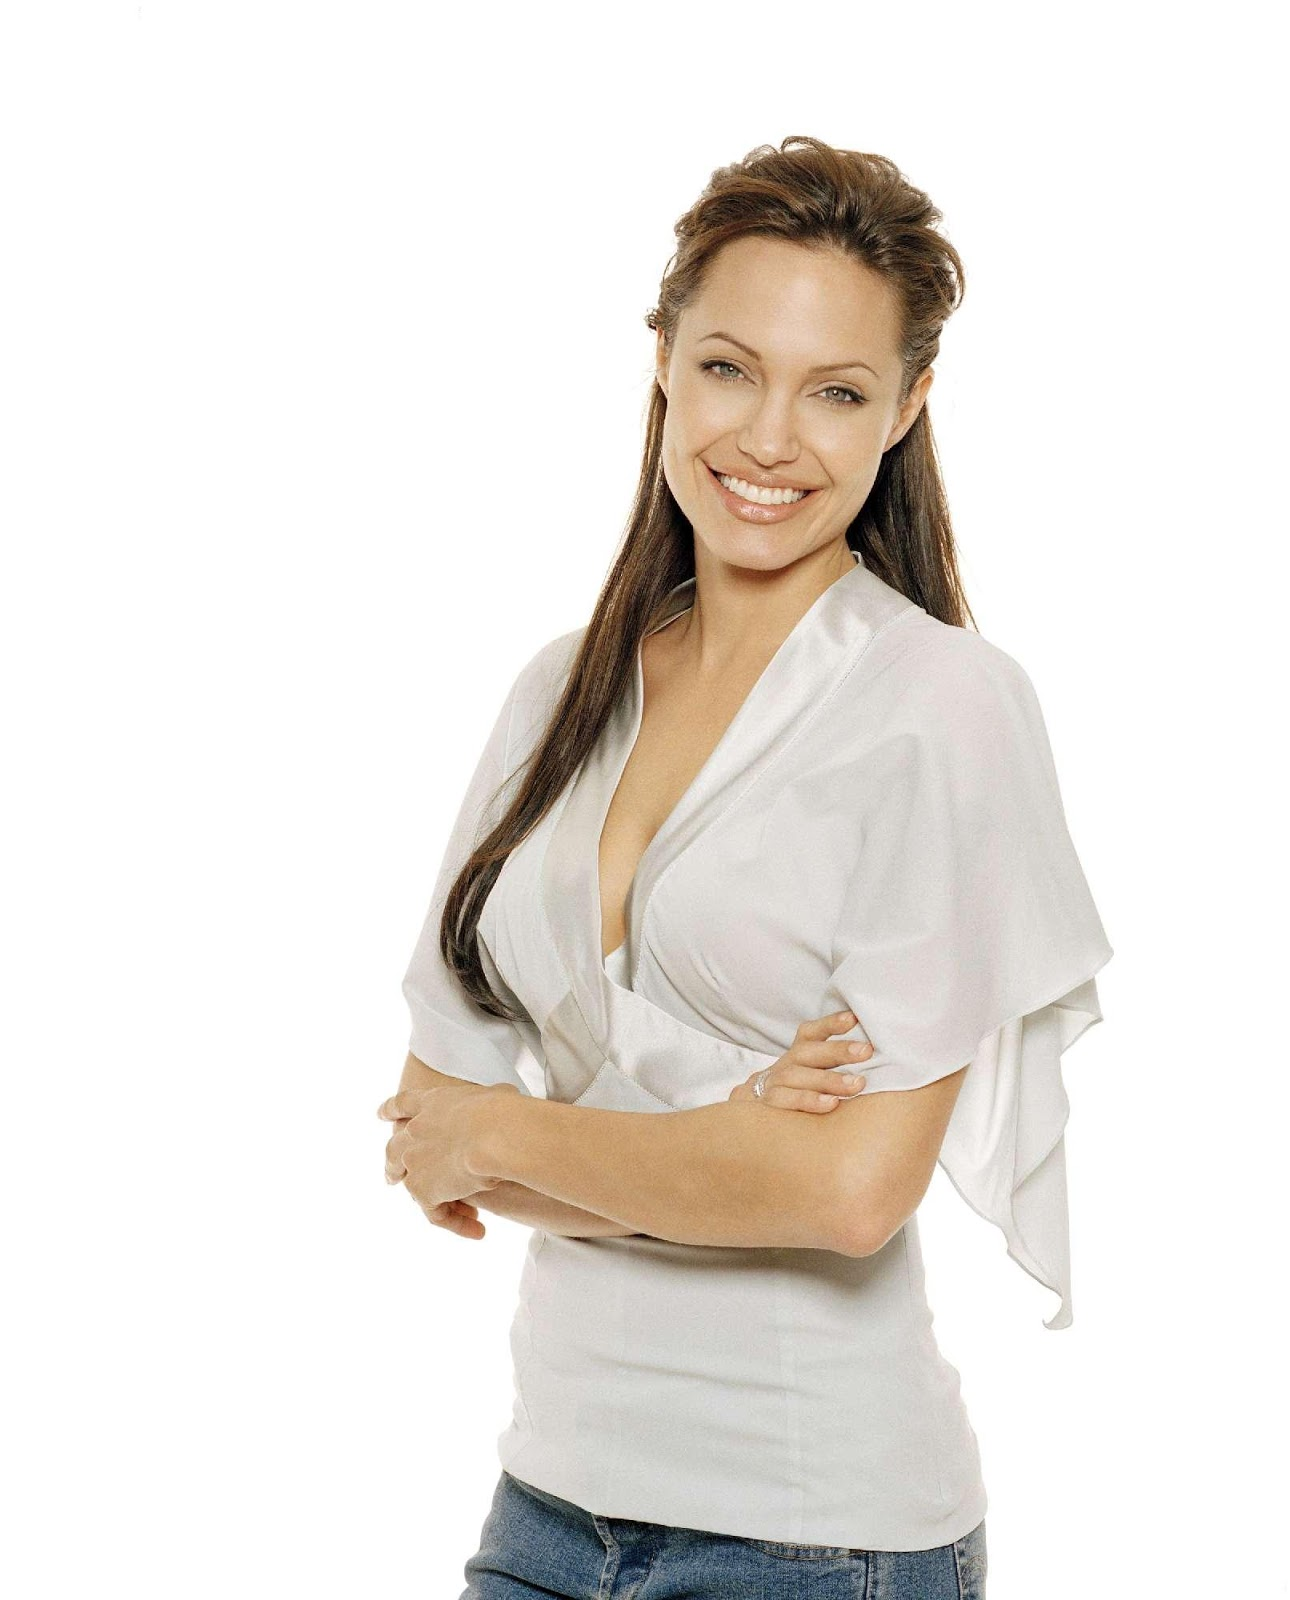 Shakira 3d Wallpaper Wallpapers Of Angelina Jolie 3d Wallpaper Nature